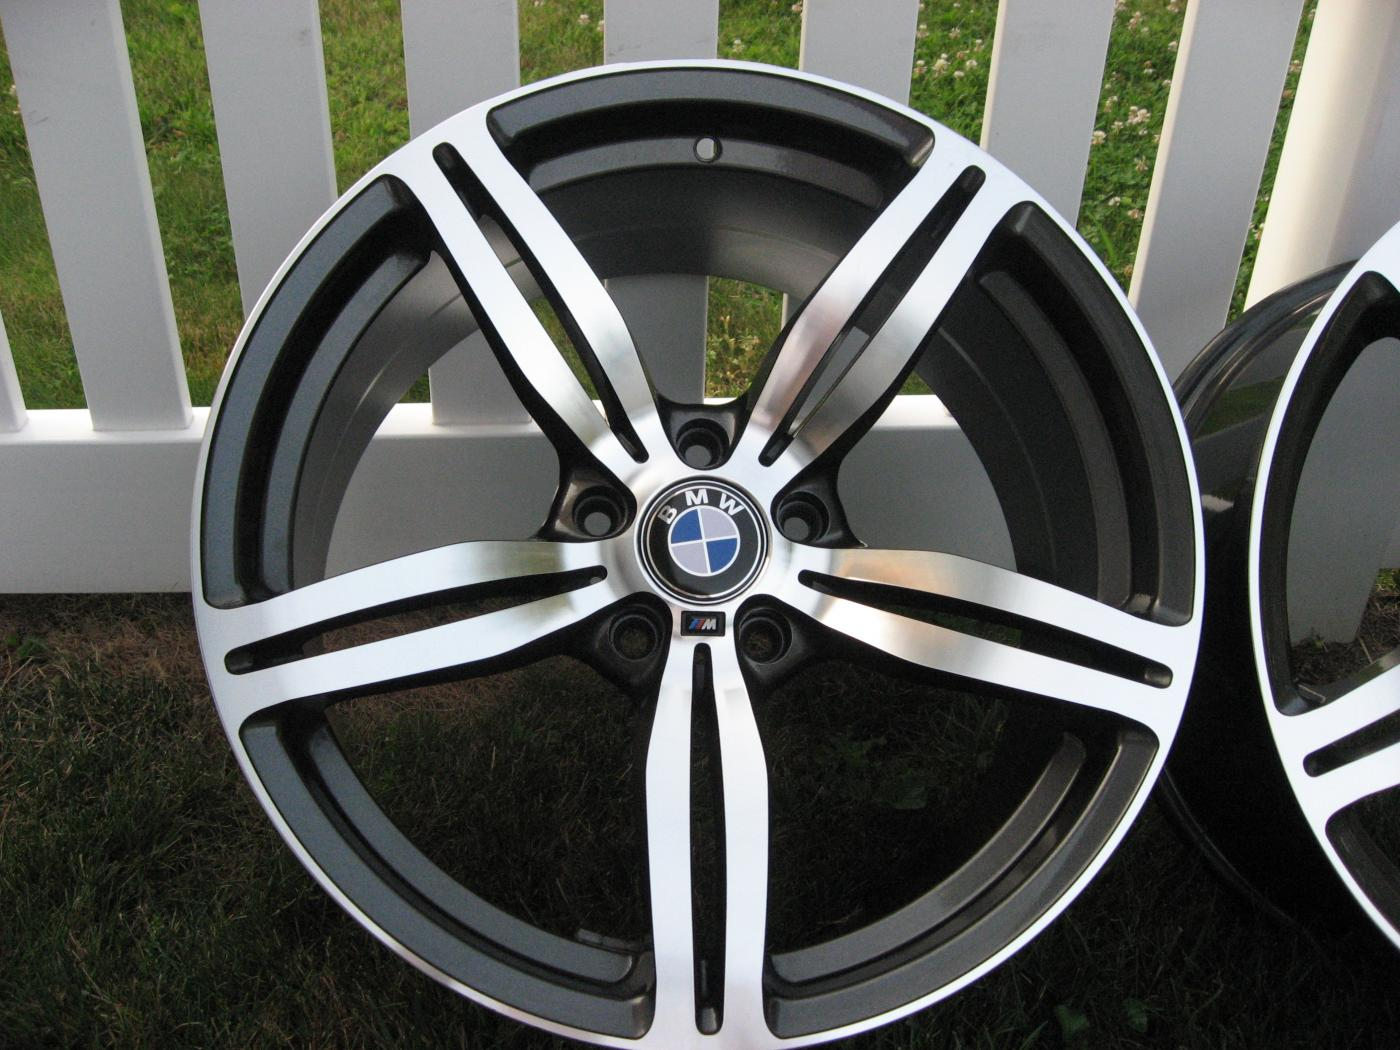 Bmw M6 Style Replica Wheels For E92 Mod Bargin Bmw 3 Series E90 E92 Forum